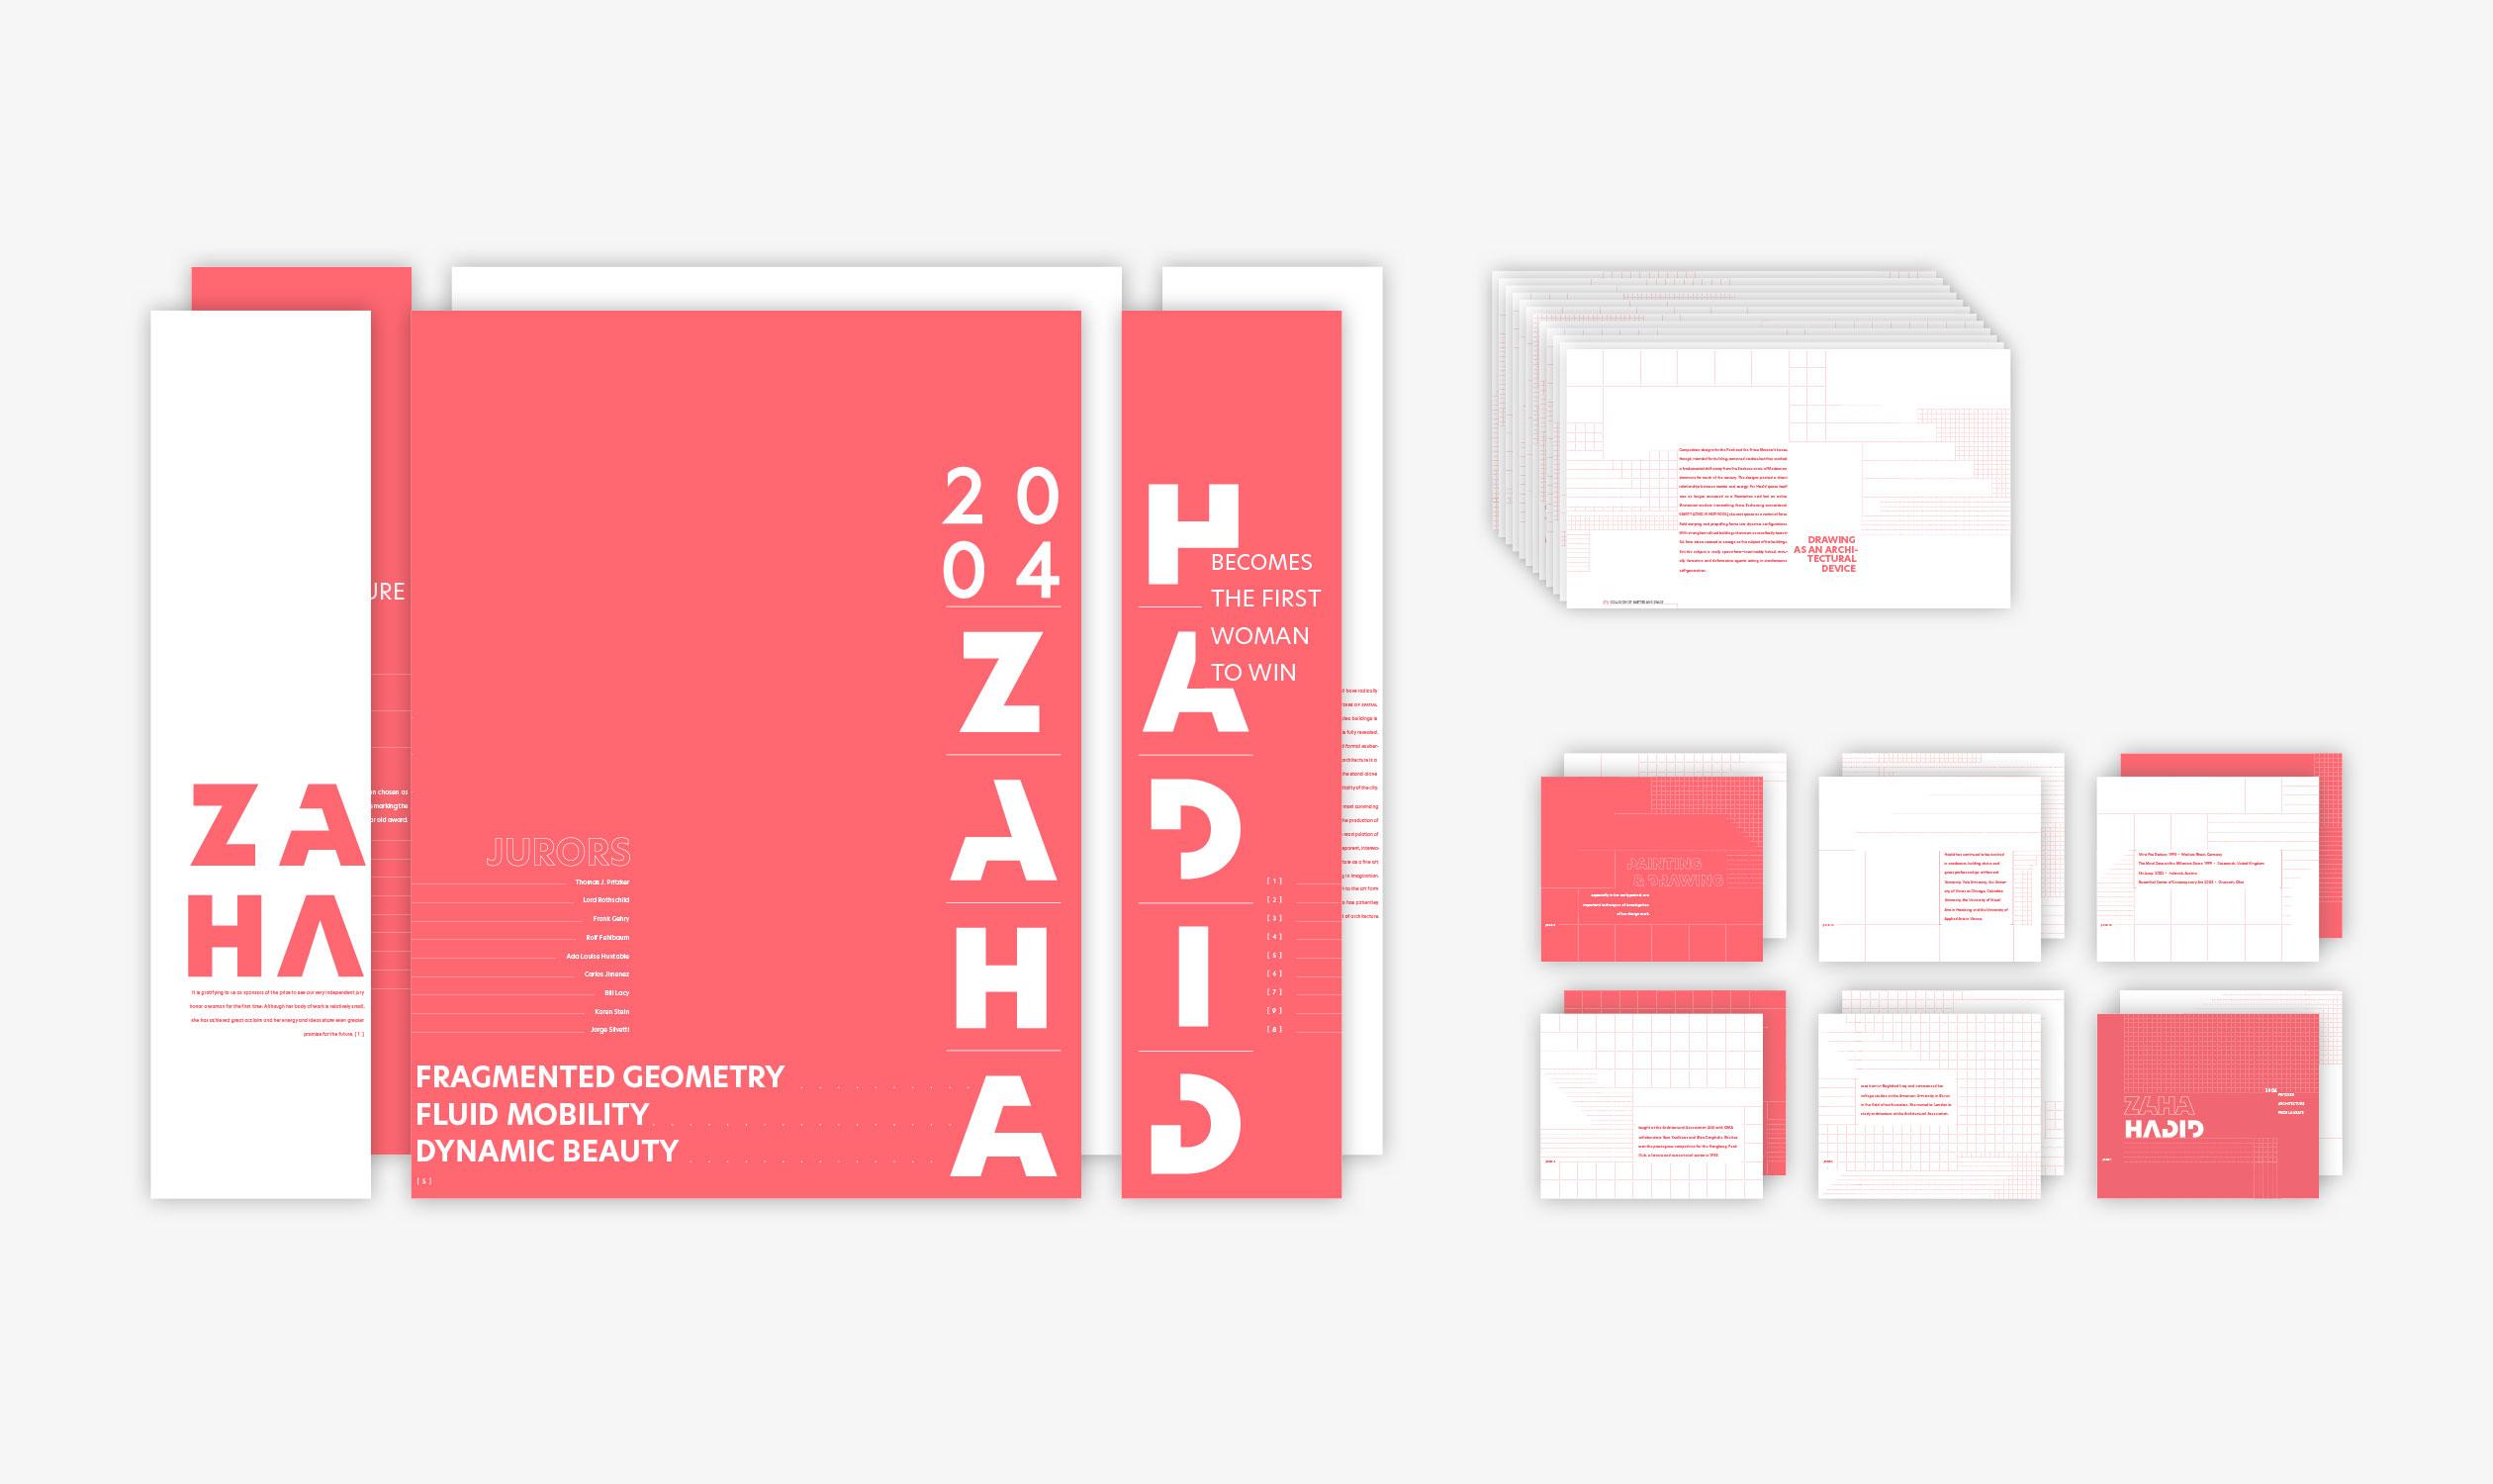 zahahadid_compiled